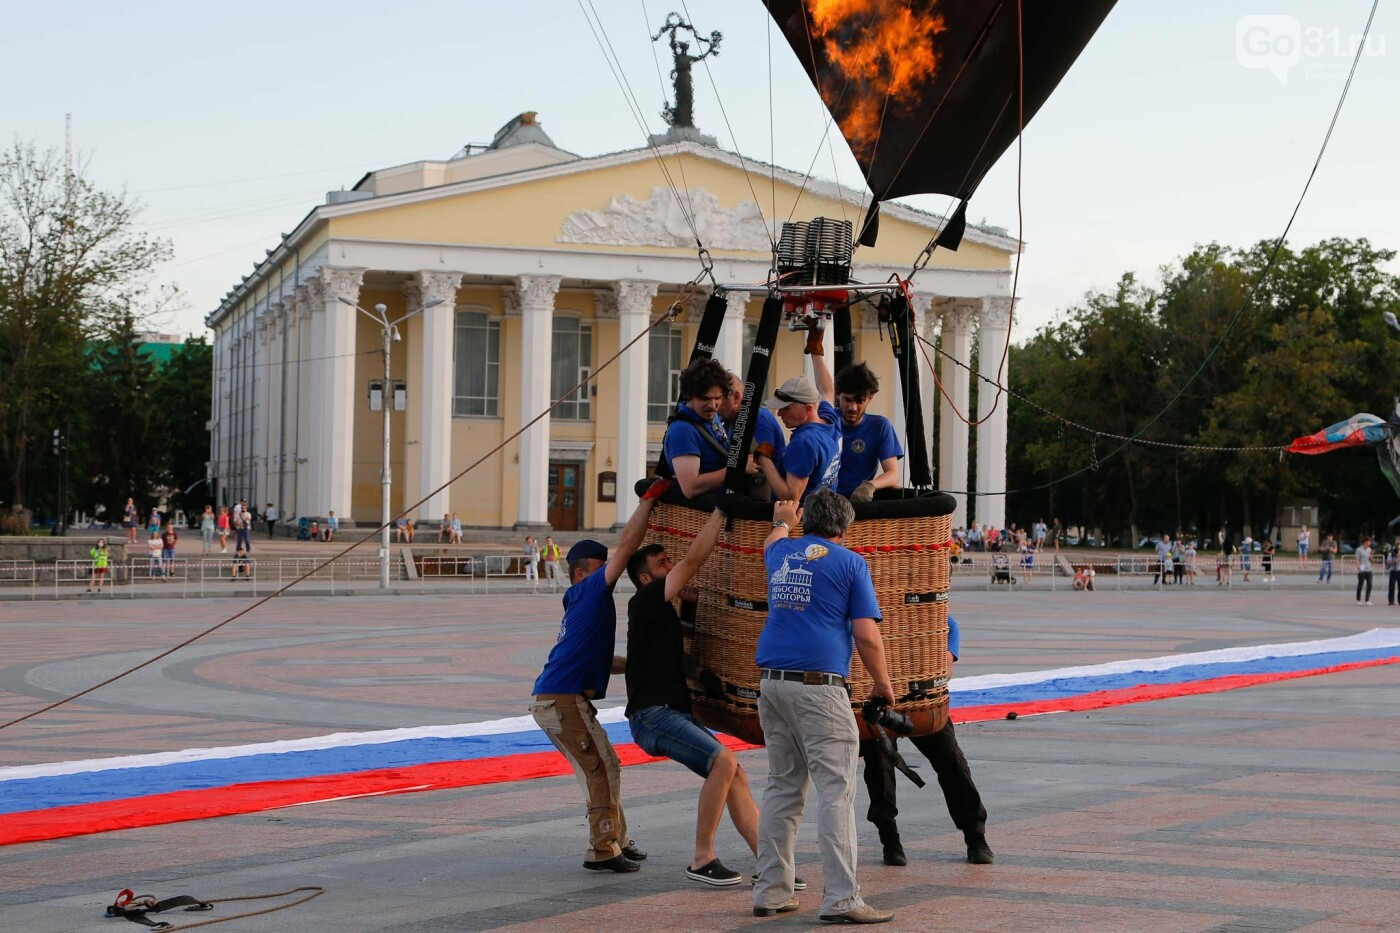 Над Белгородом пролетел аэростат с гигантским триколором, фото-20, Фото: Антон Вергун